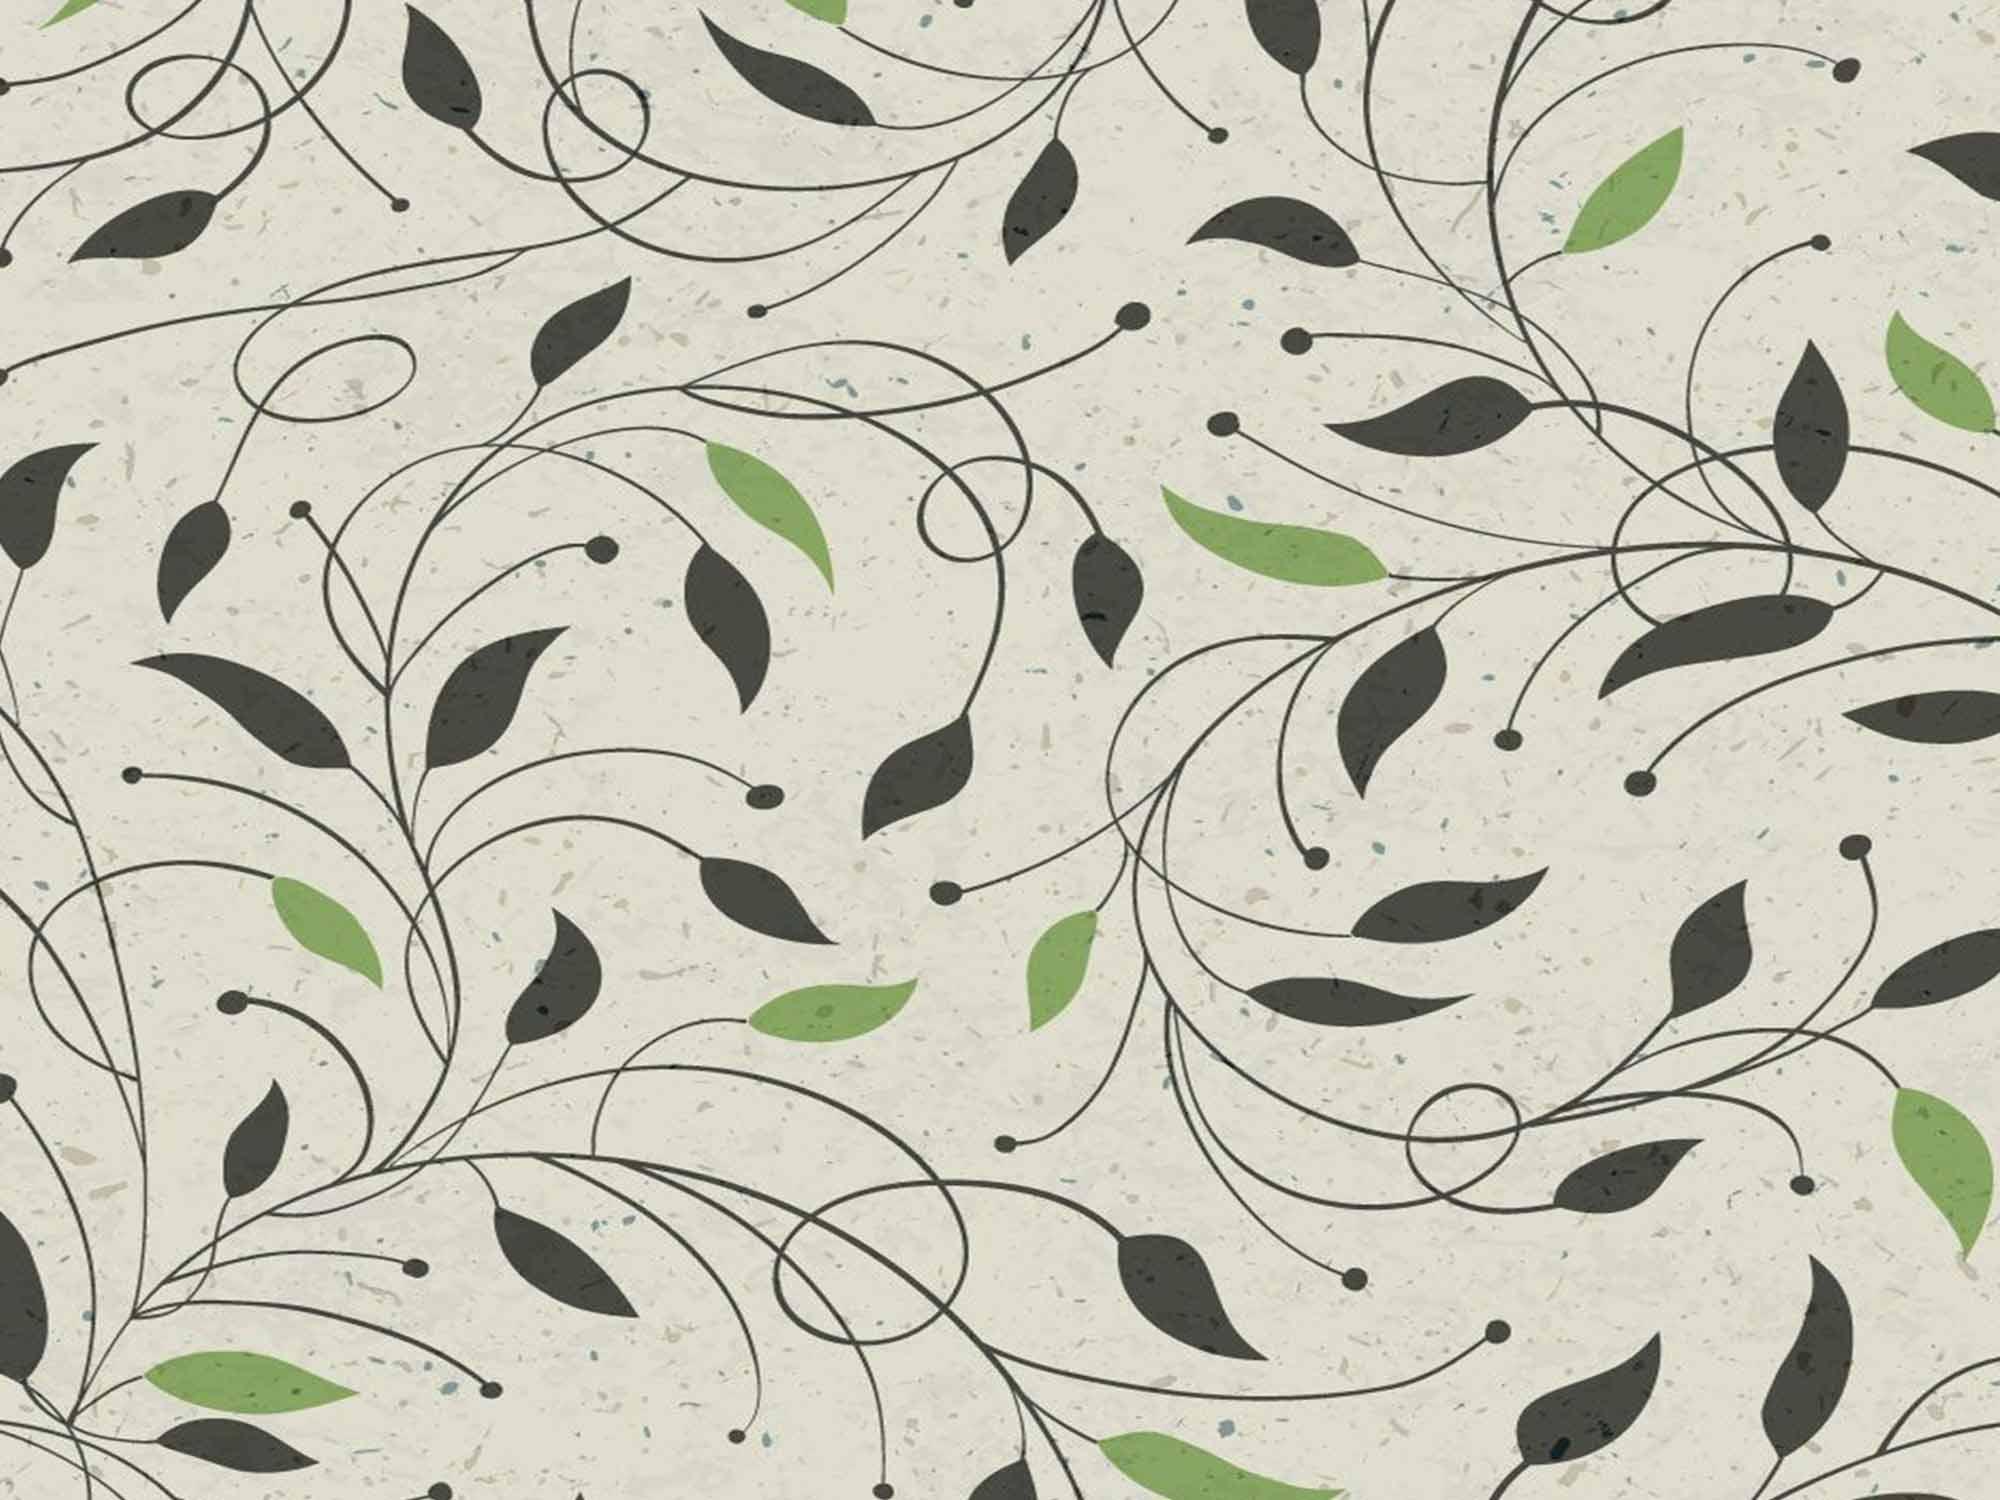 Papel de Parede Floral 0093 - Adesivos de Parede  - Paredes Decoradas